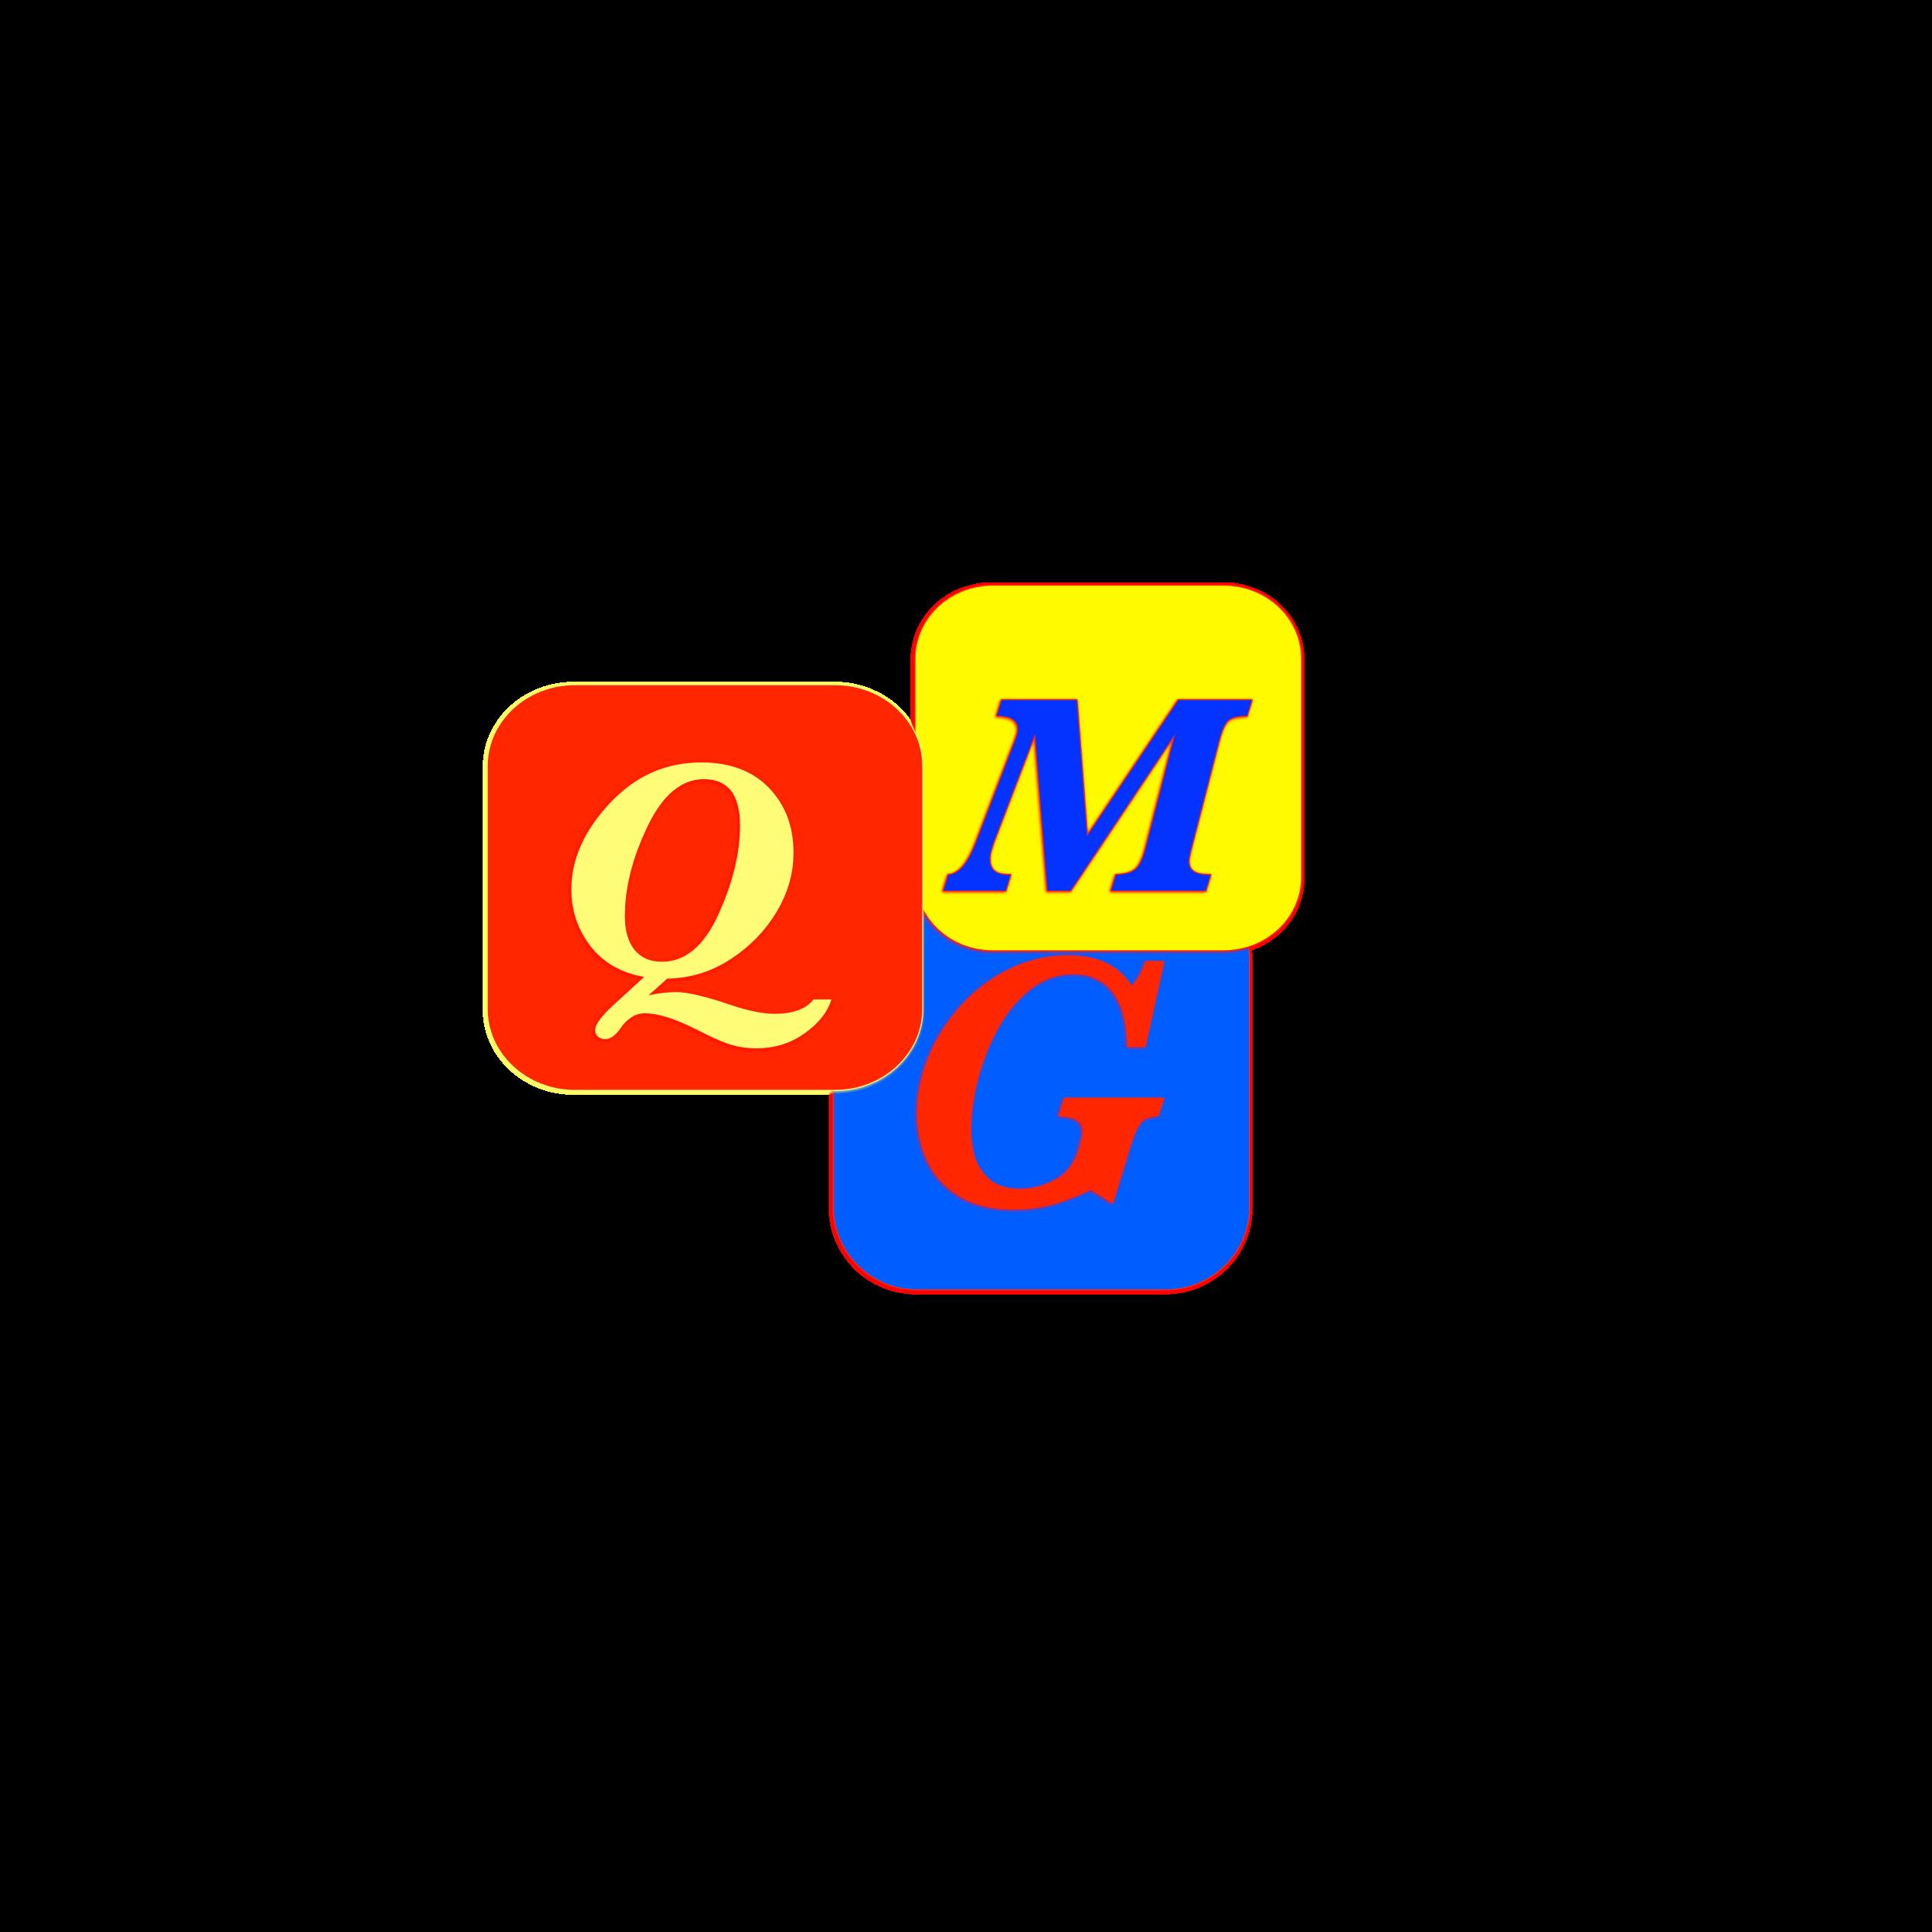 Qmg Cleaning Service Llc In Brooklyn Ny 11249